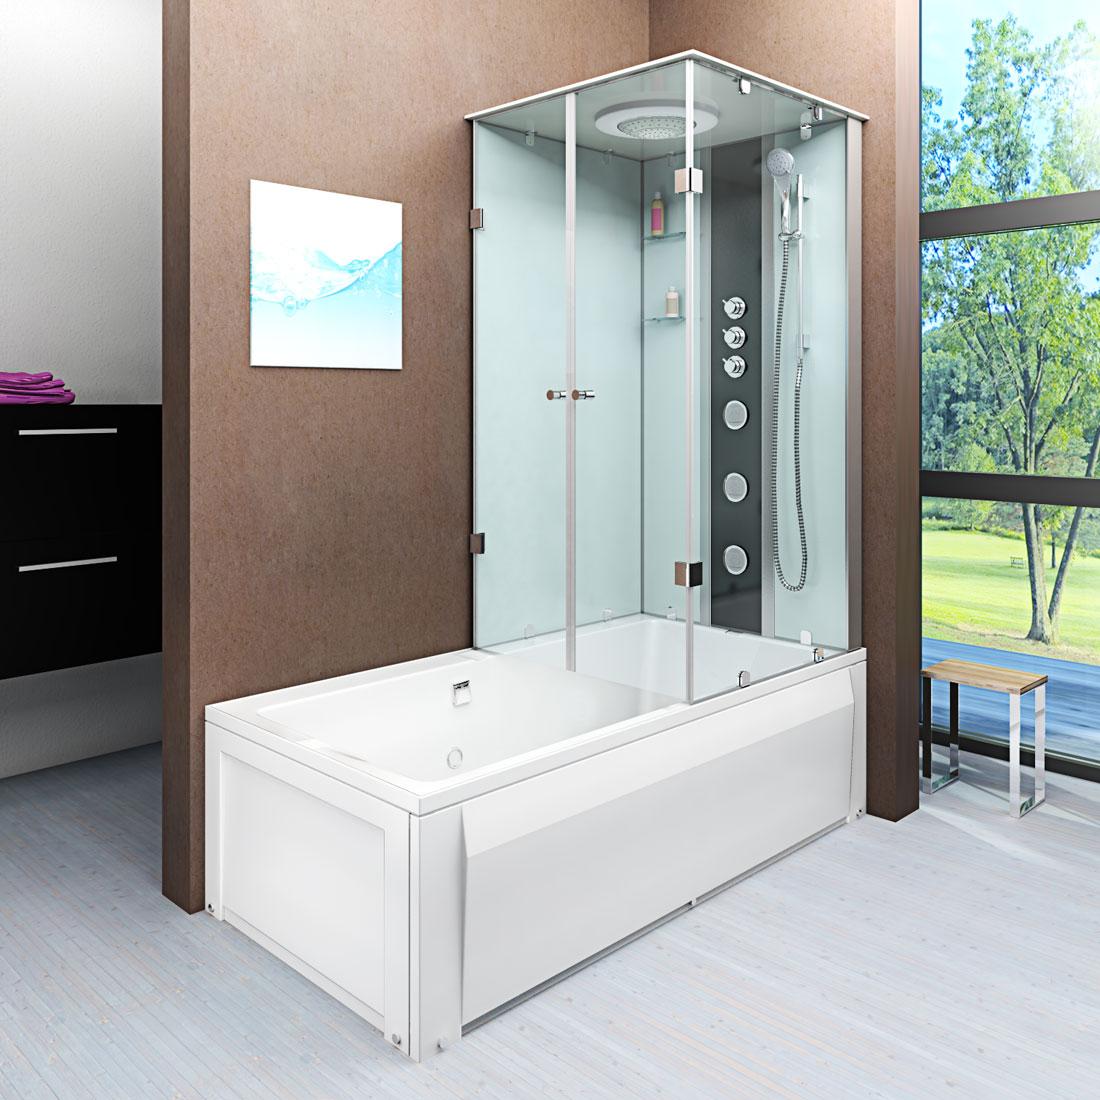 acquavapore dtp50 a004l dusch wannen kombi in 180x90cm trendbad24. Black Bedroom Furniture Sets. Home Design Ideas